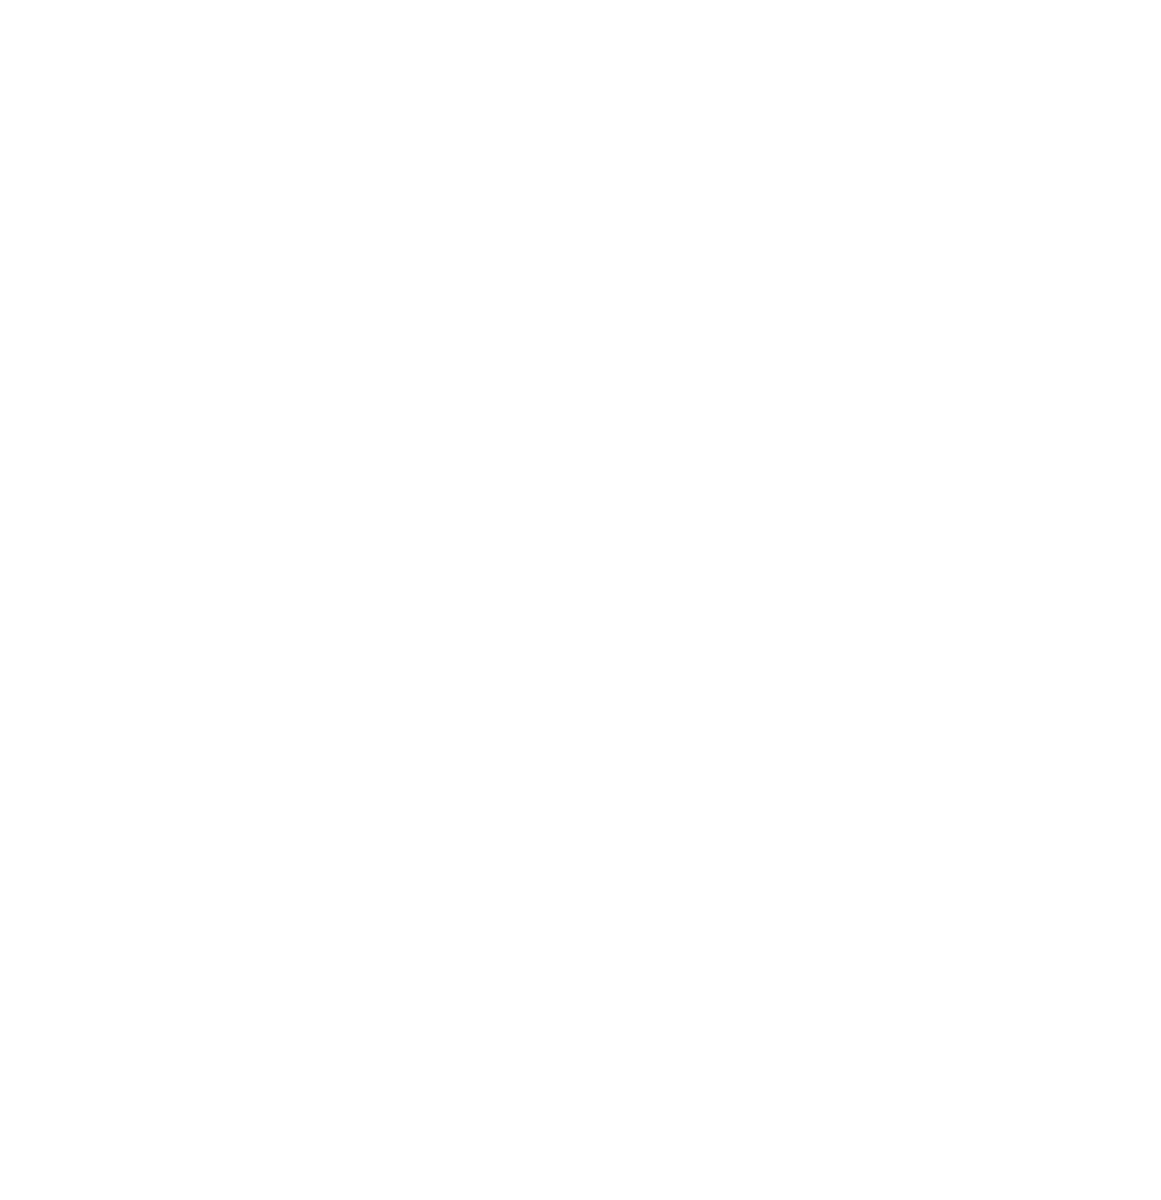 white_icon_puzzle_piece